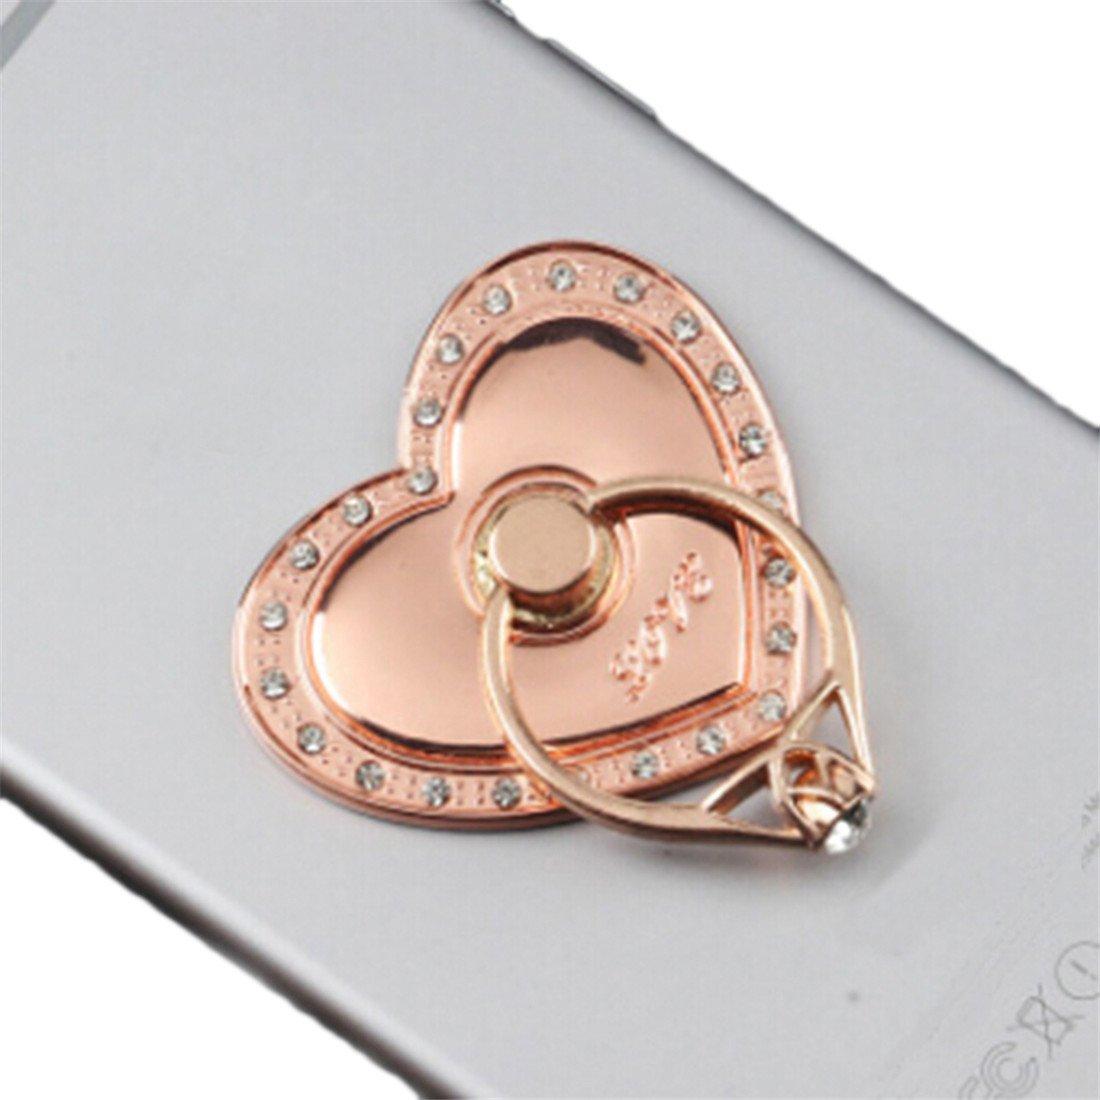 VWH Heart Shaped Phone Ring Bracket Holder Phone Holder (Rose gold)